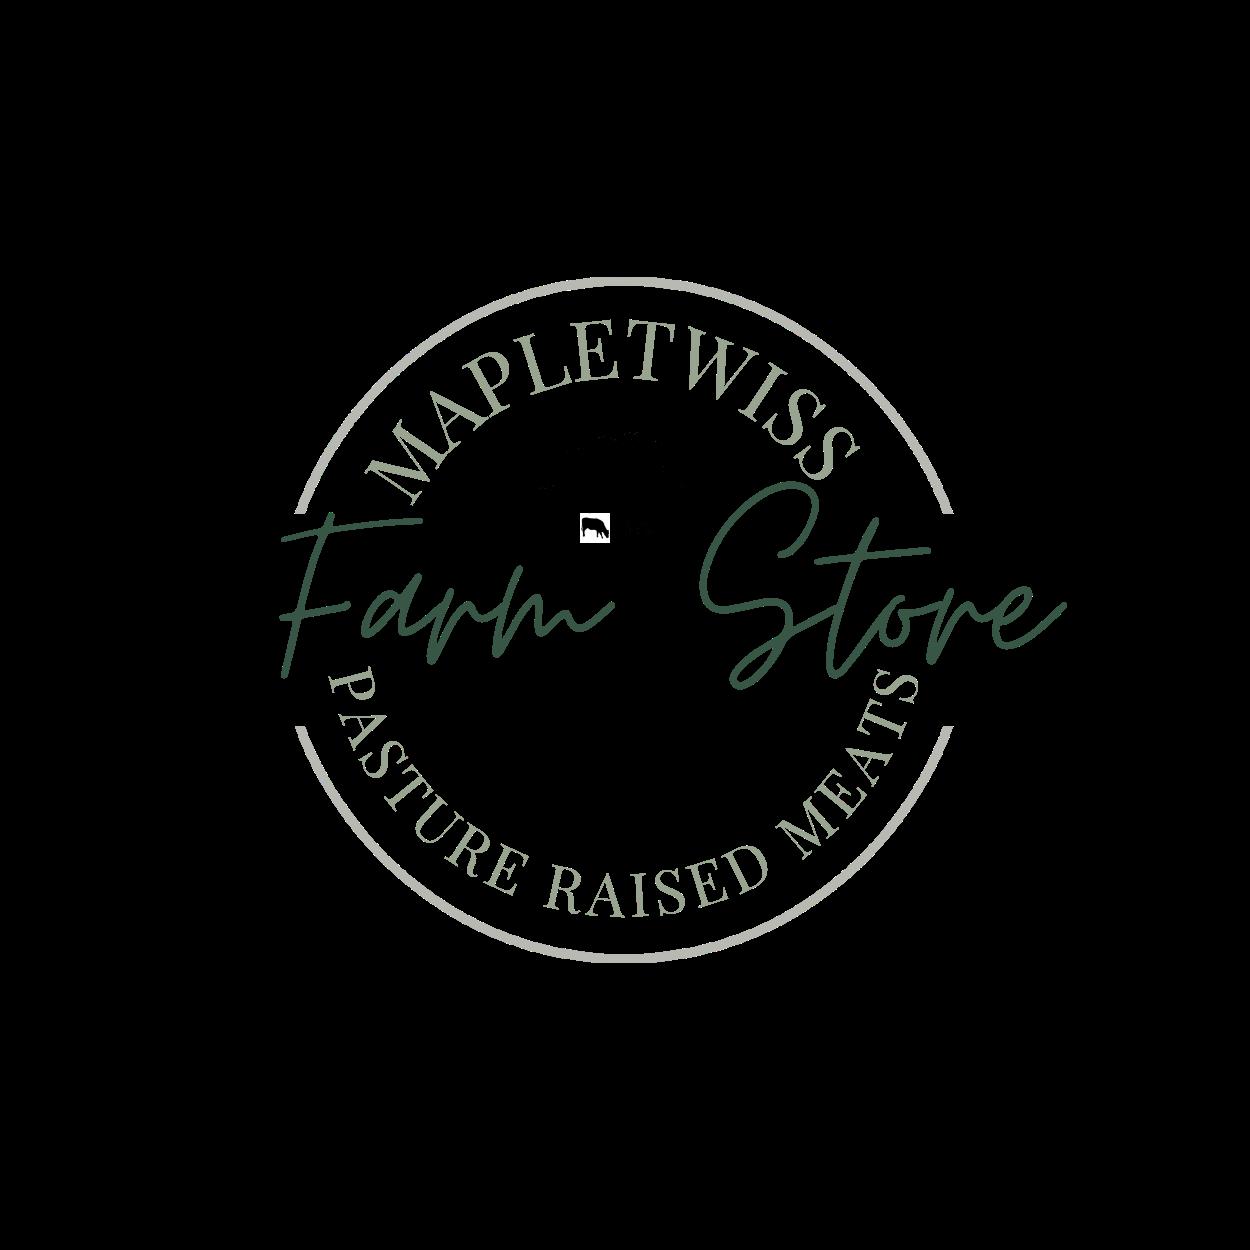 Mapletwiss Farm-Farm store-Arthur